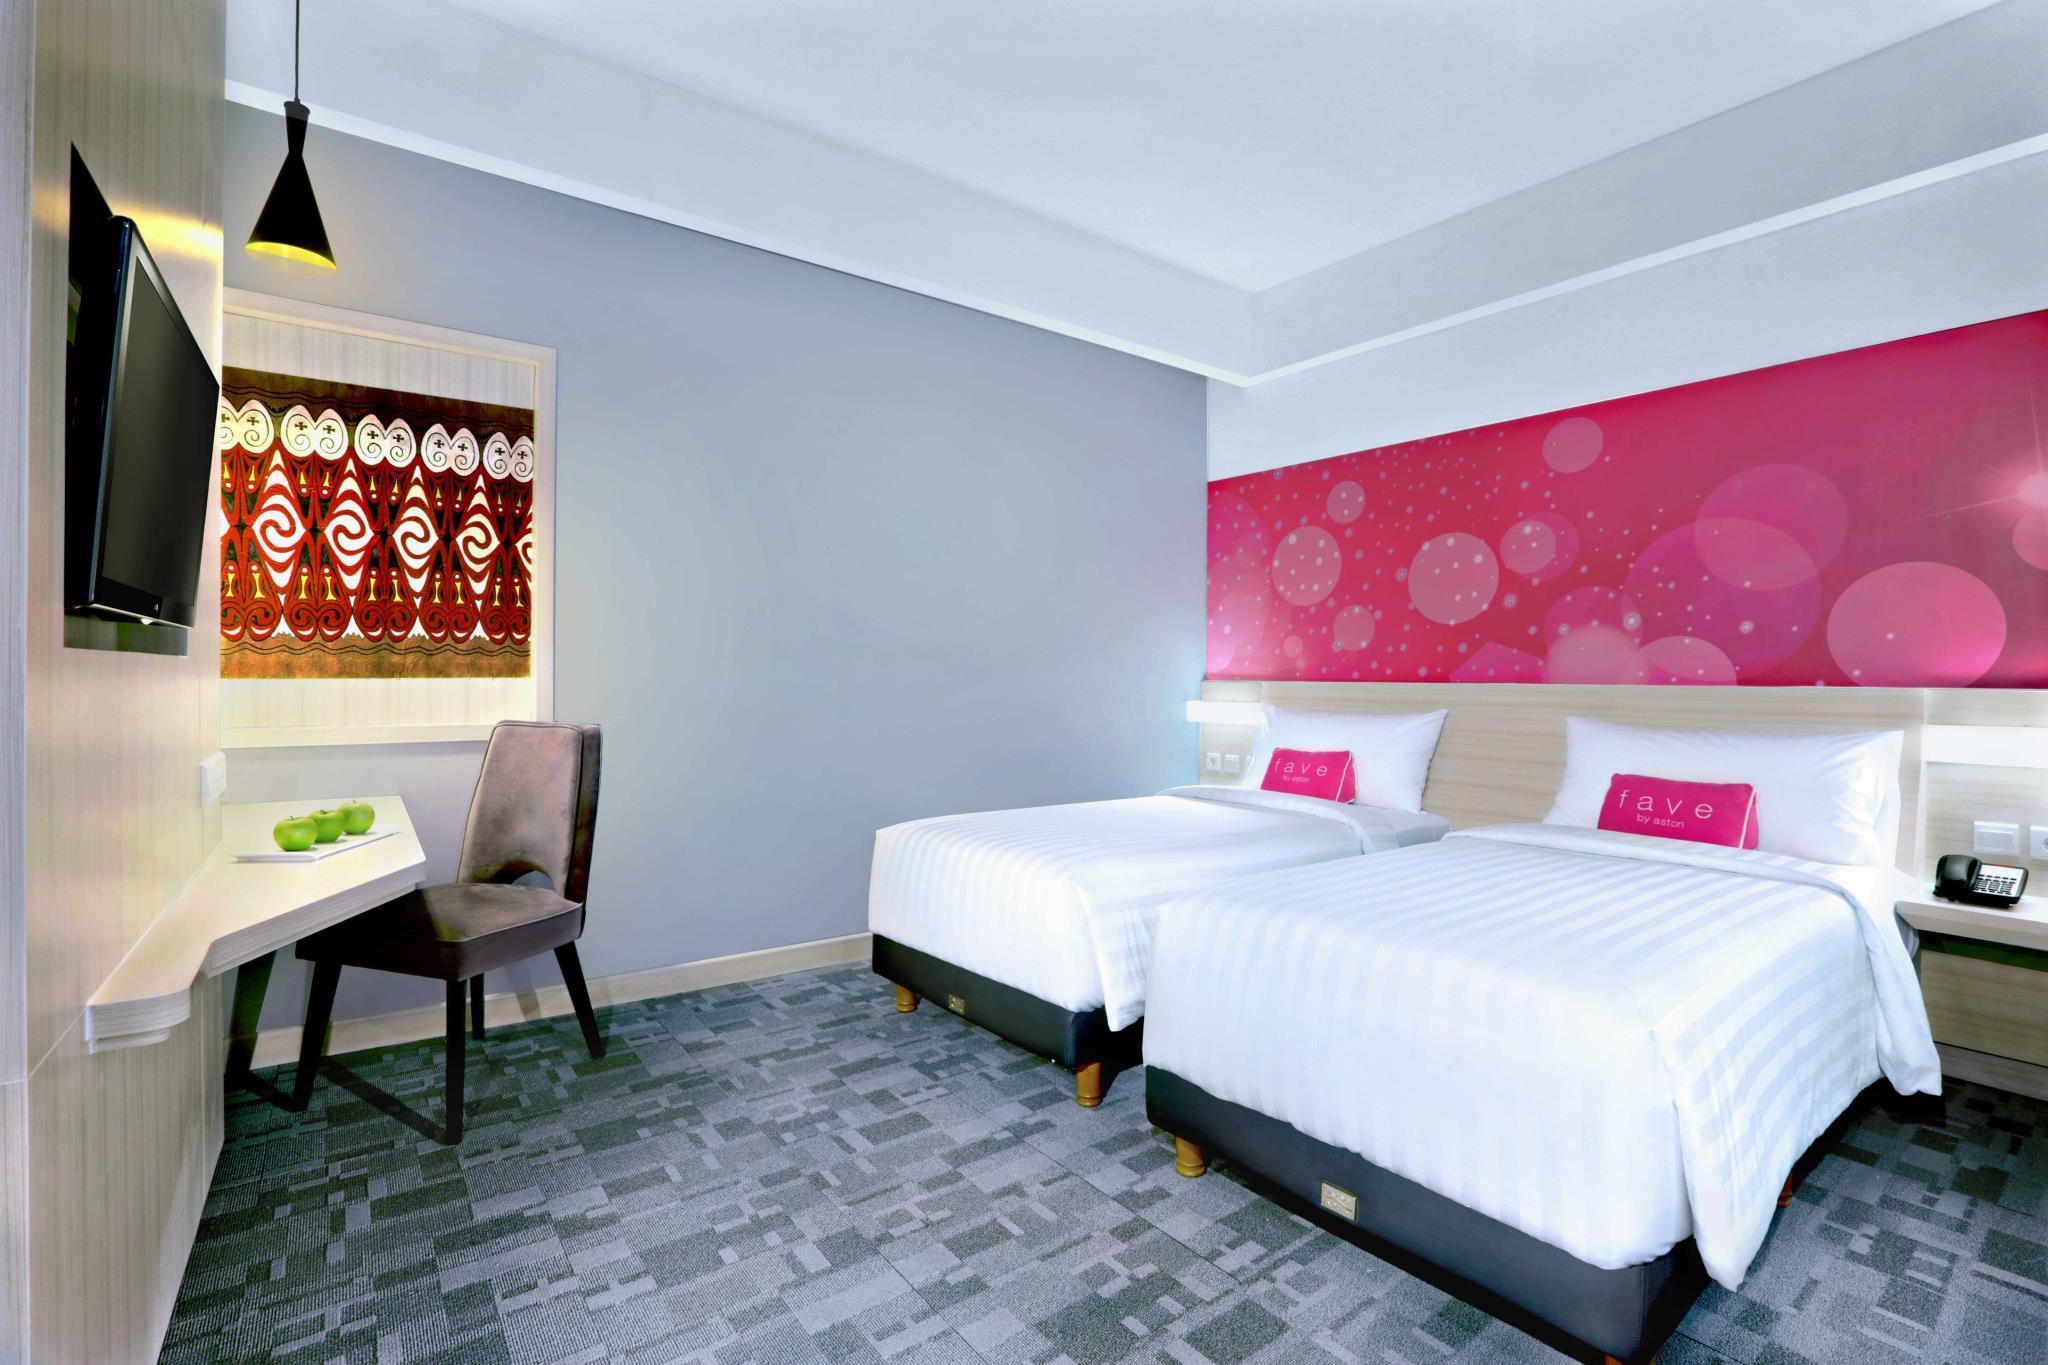 Hotel favehotel Jayapura - Jalan Jenderal Ahmad Yani No. 12 Gurabesi, Jayapura Utara - Jayapura